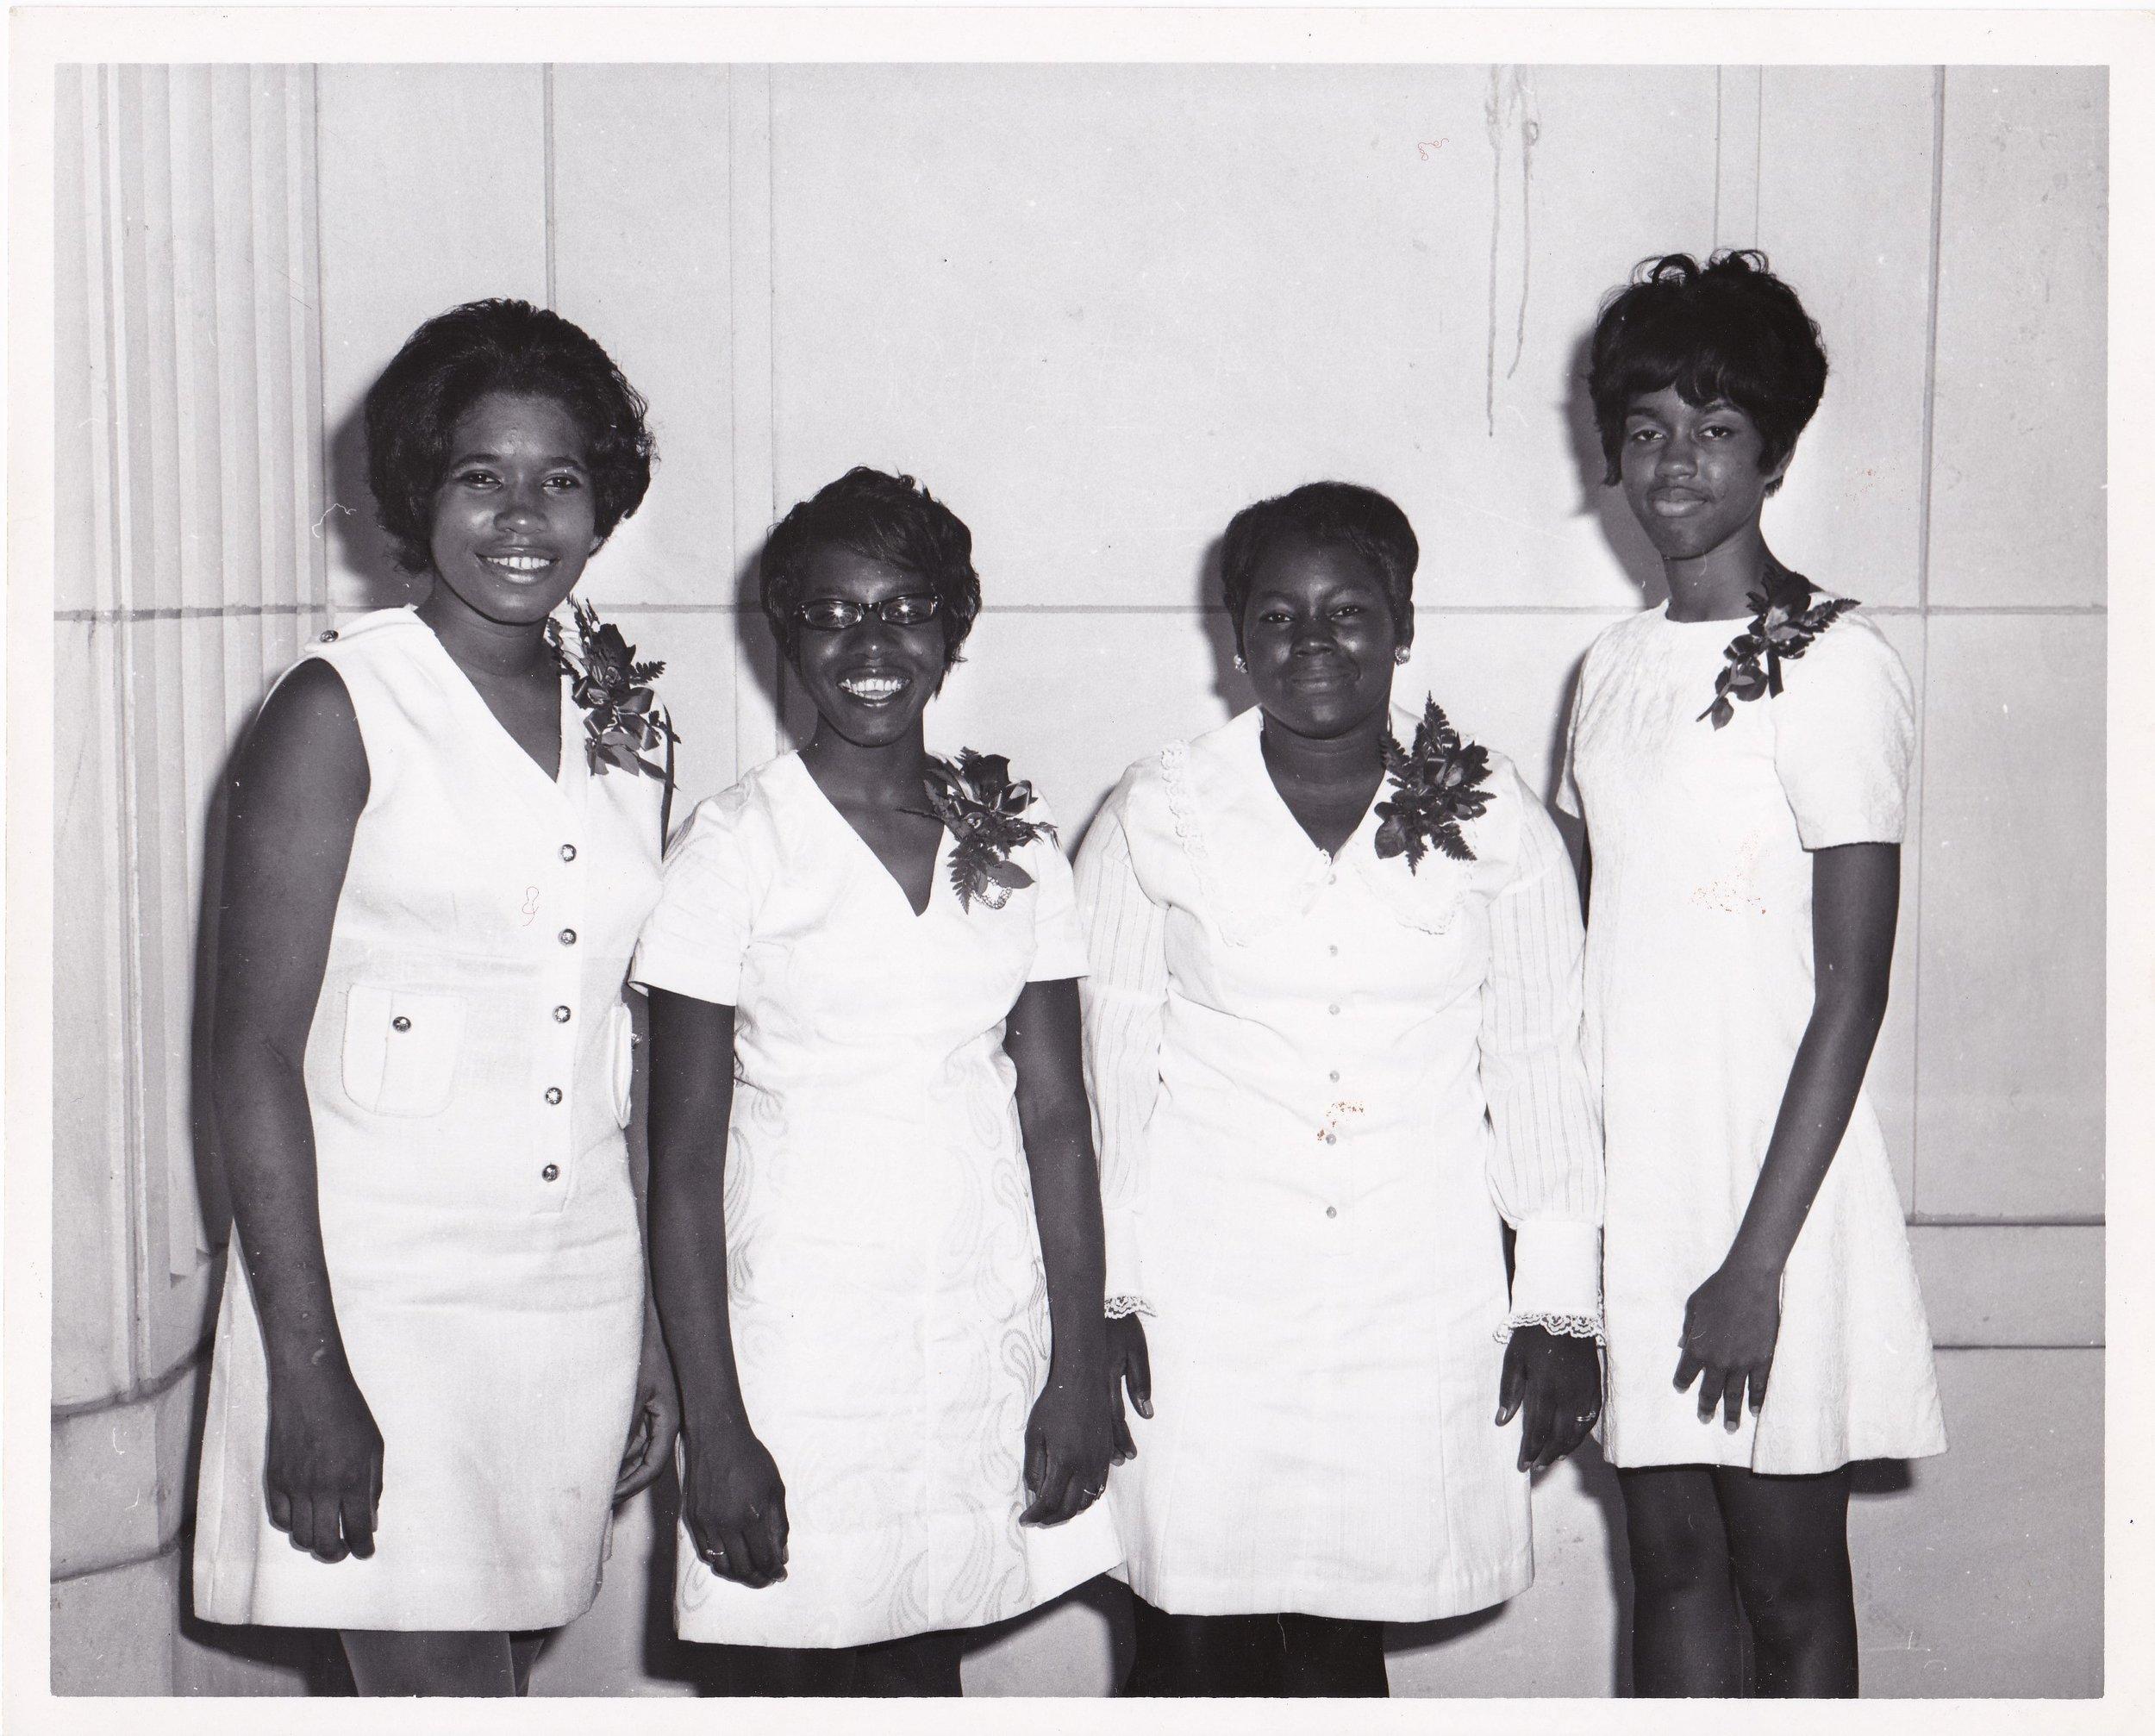 #13: '70 Jacquelyn Simms, ________, Terry Shaw, Phyllis Jackson